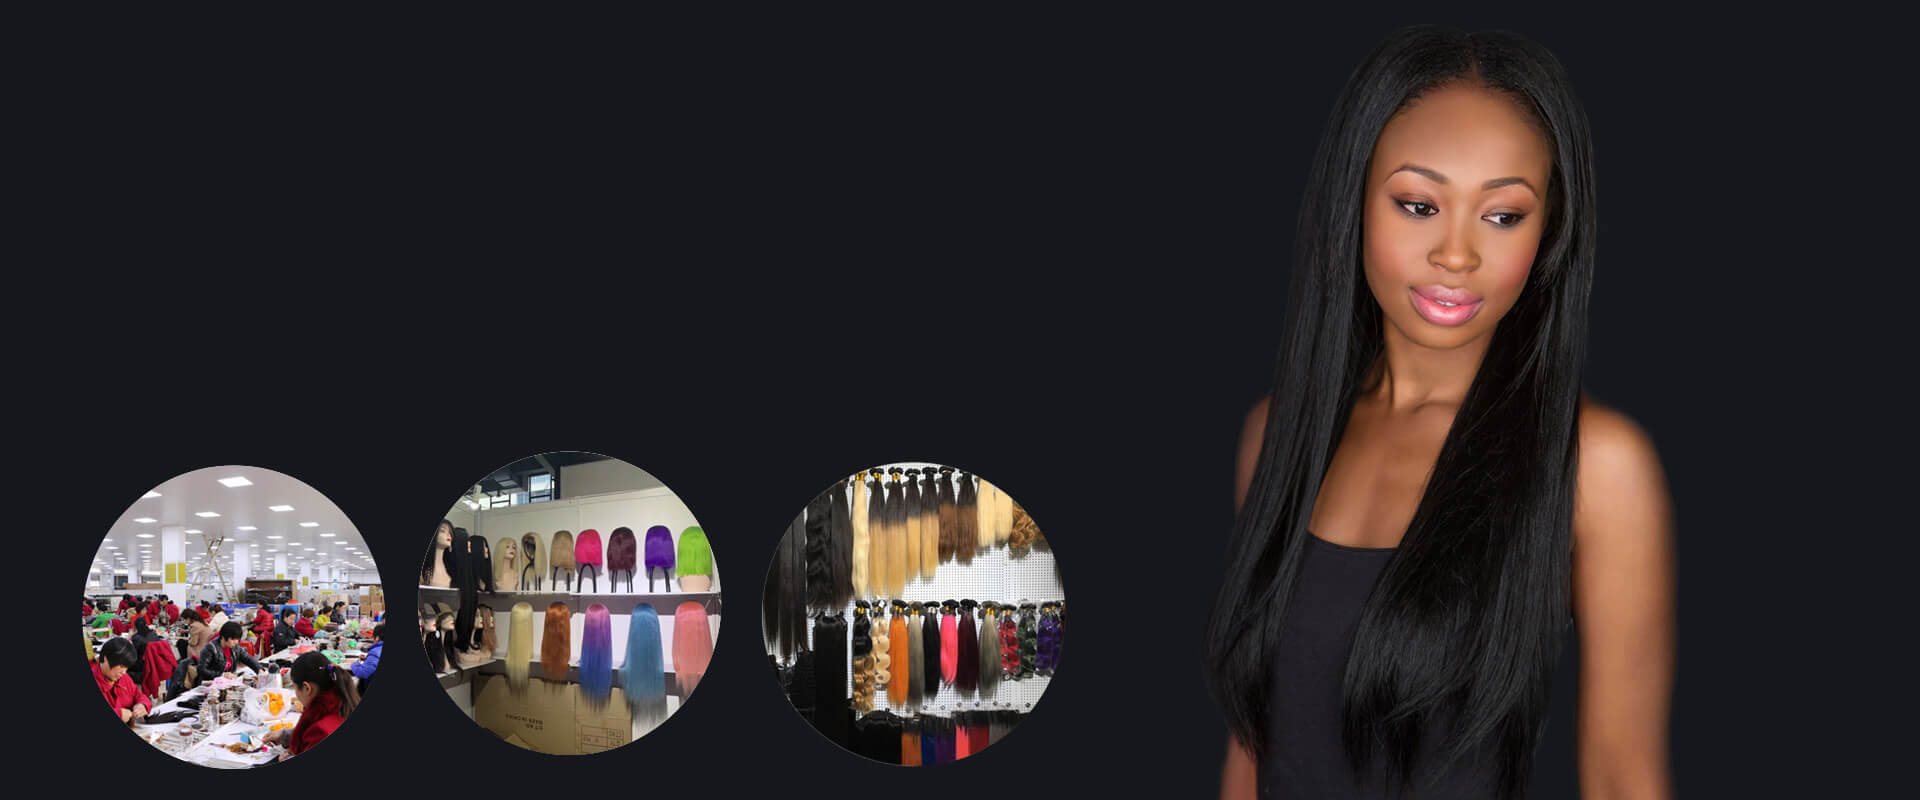 brazilian-virgin-ombre-hair-bundles-banner-02